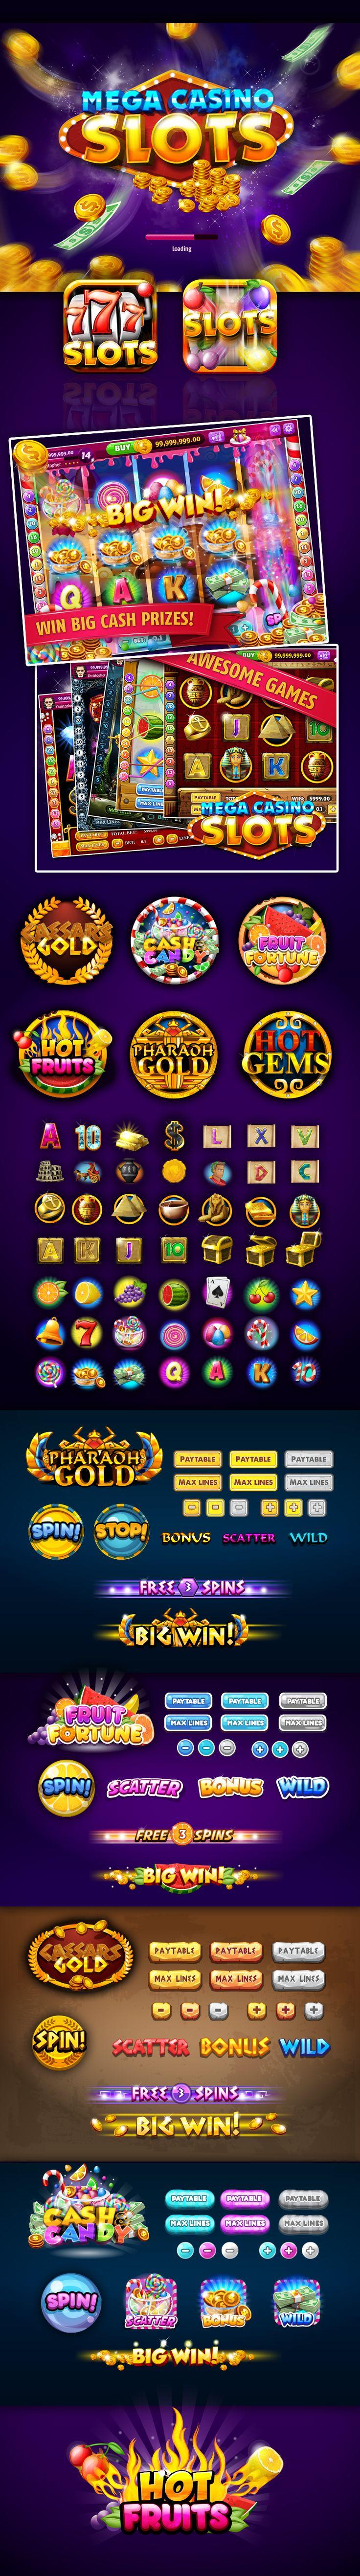 Mega Casino Slots - Game on Behance